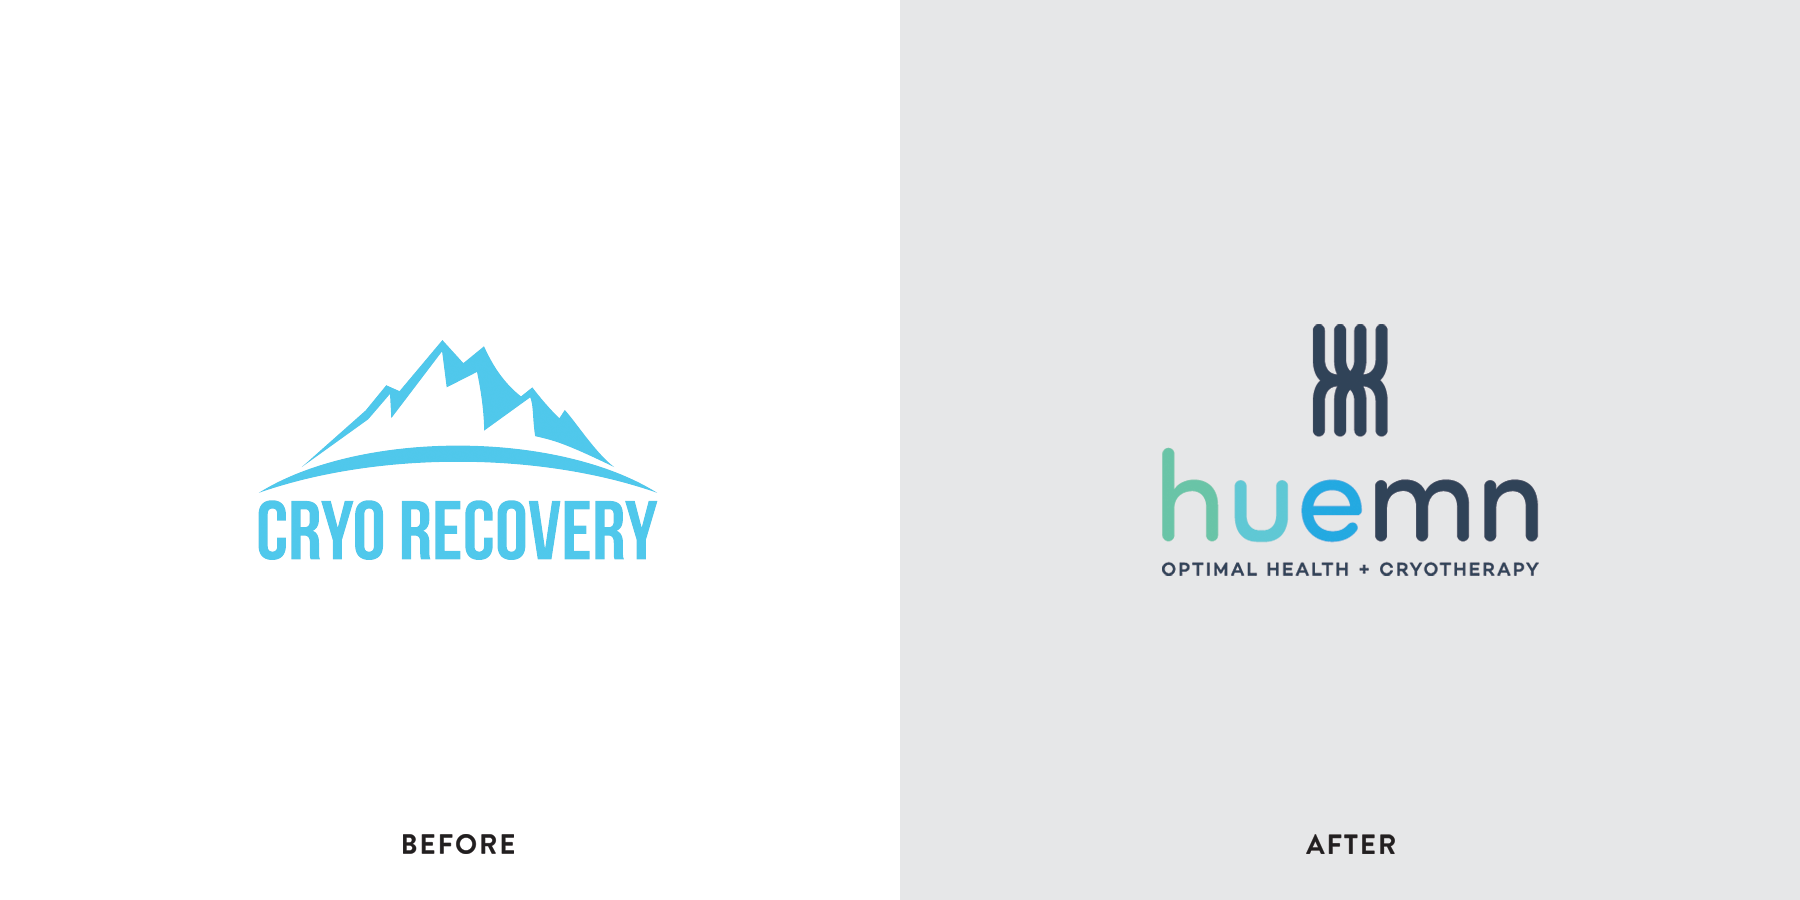 FlourishCollaborative_Launching_Your_Rebrand_CryoRecovery_Huemn_Logo.png